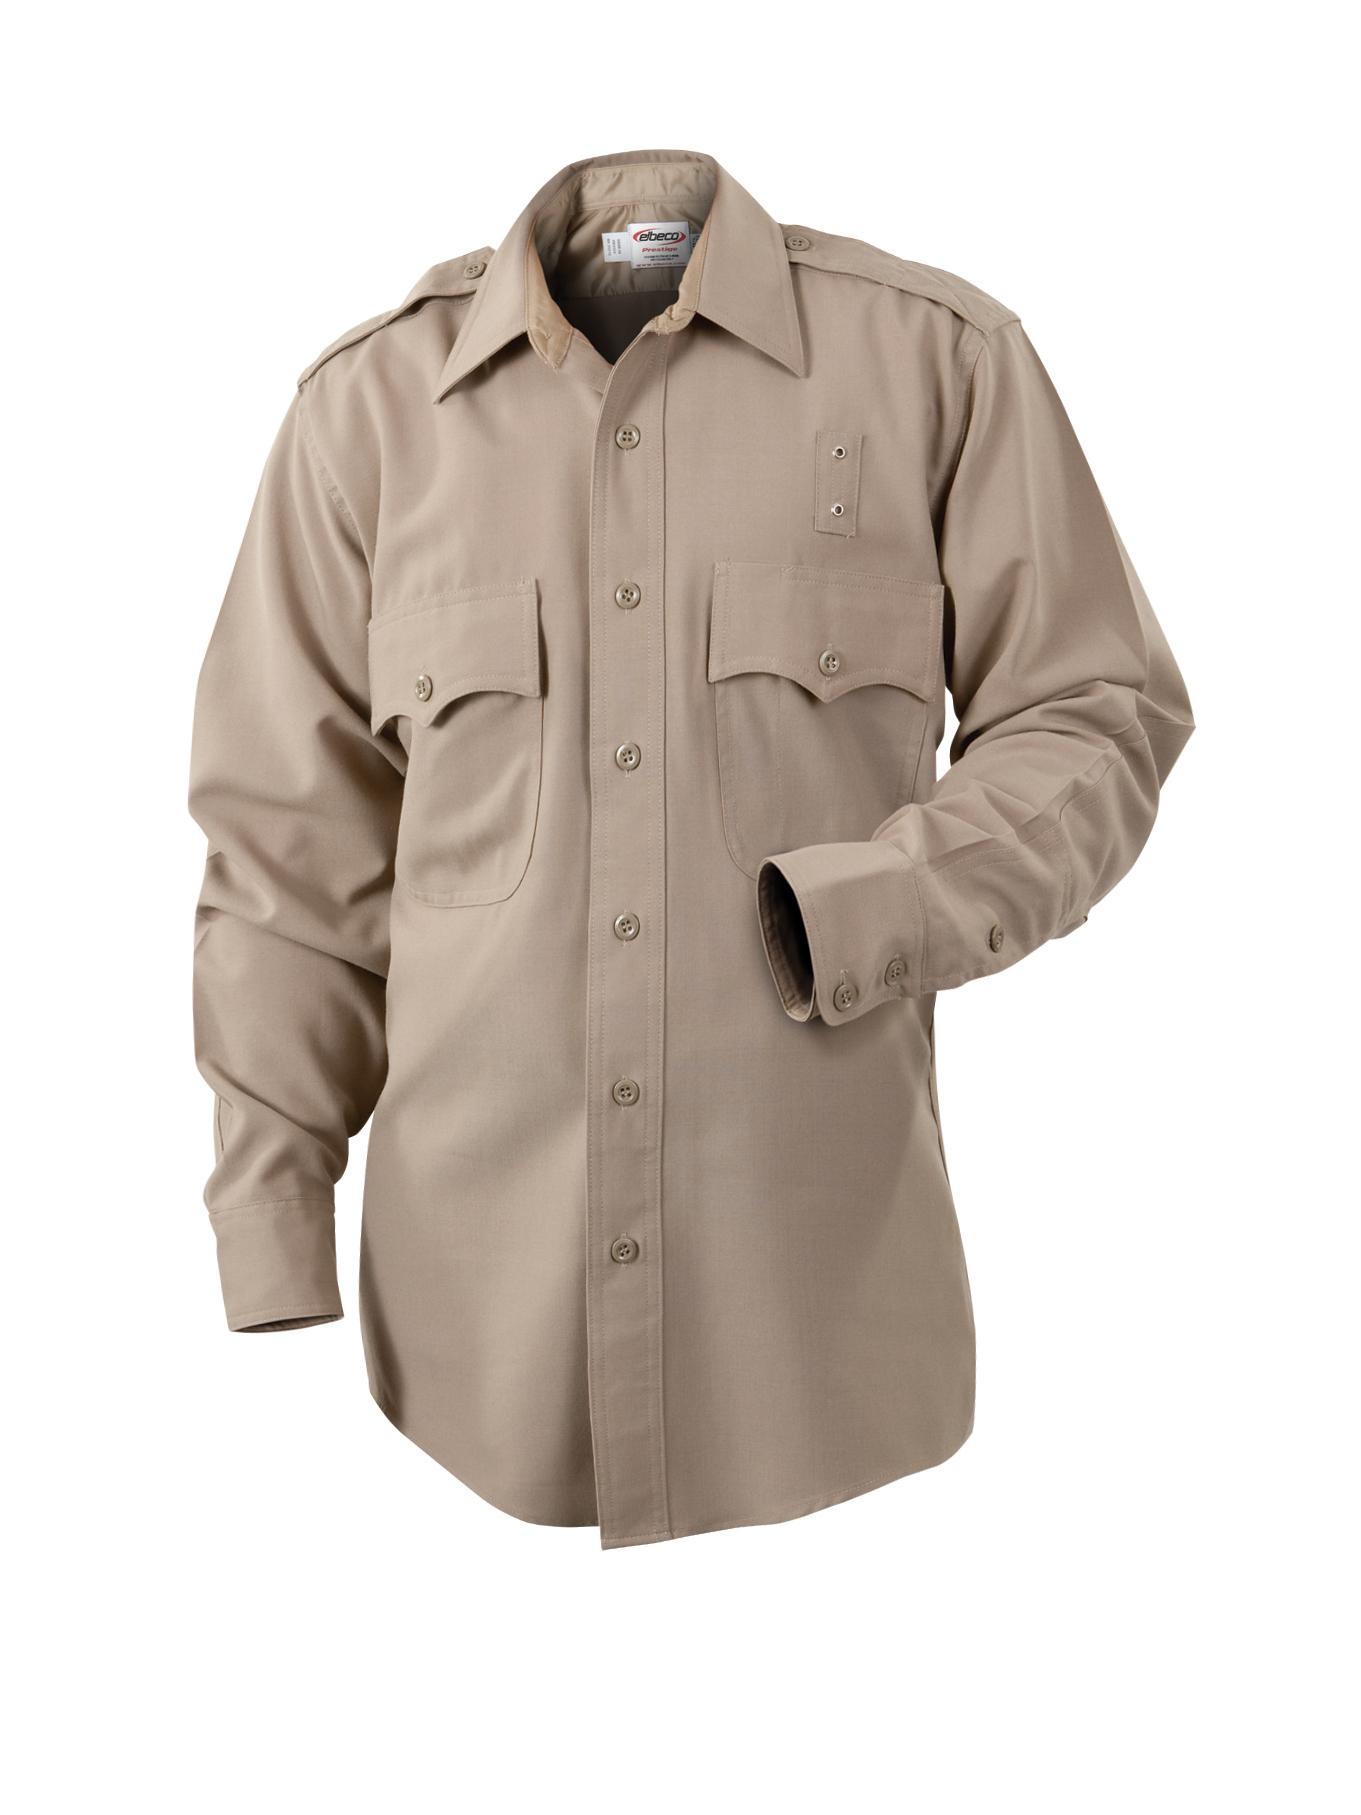 ced9c9267ed12 Buy LA County Sheriff/West Coast Long Sleeve Shirt-Womens - Elbeco ...